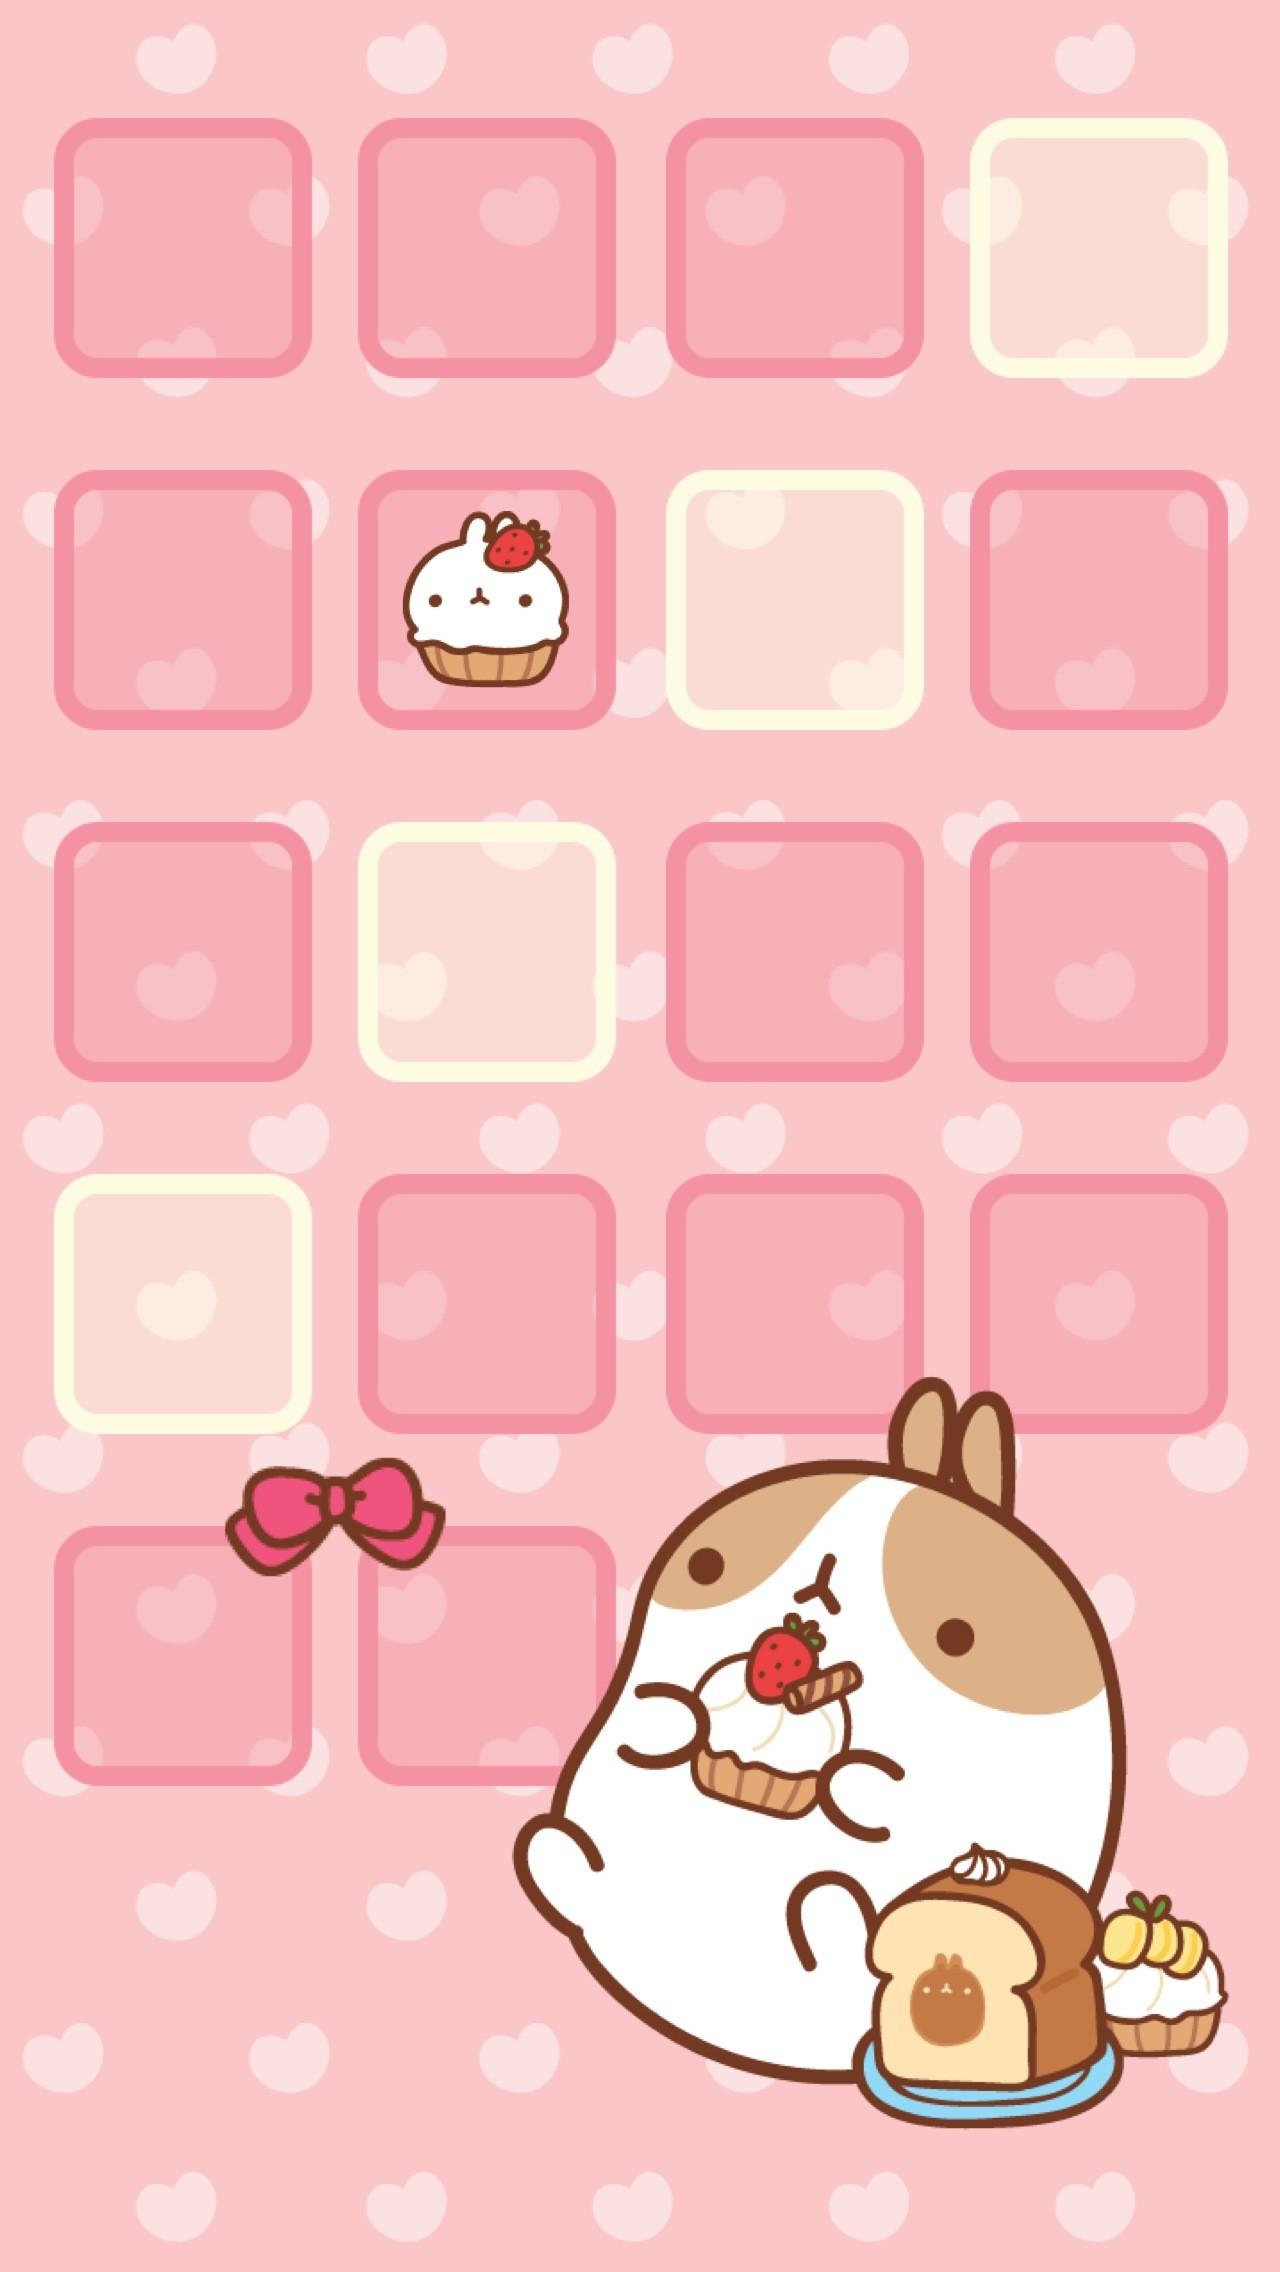 Cute Iphone HD Wallpapers